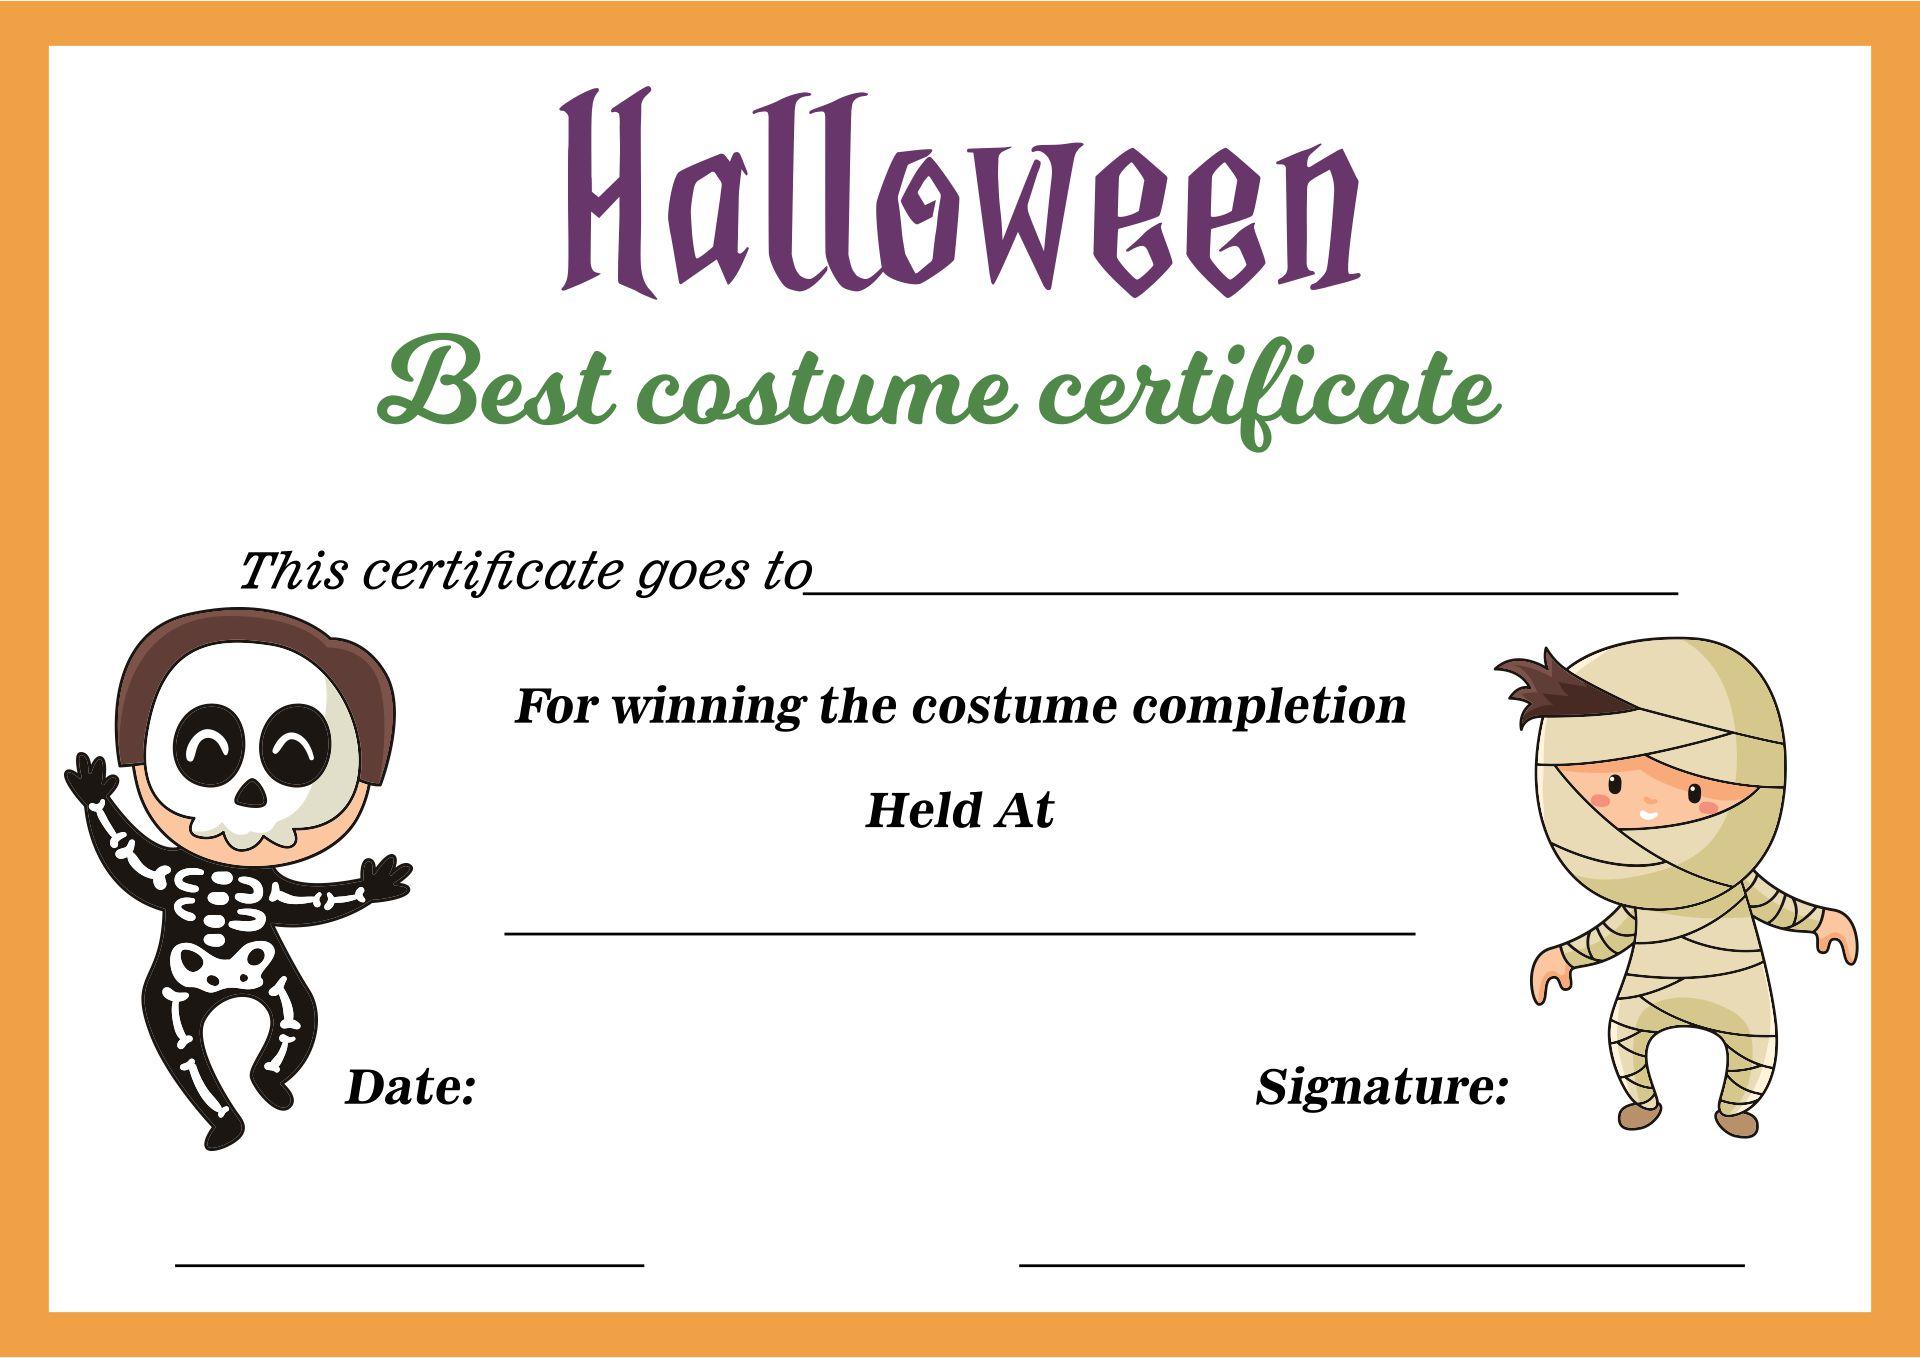 Halloween Best Costume Award Printable Certificates